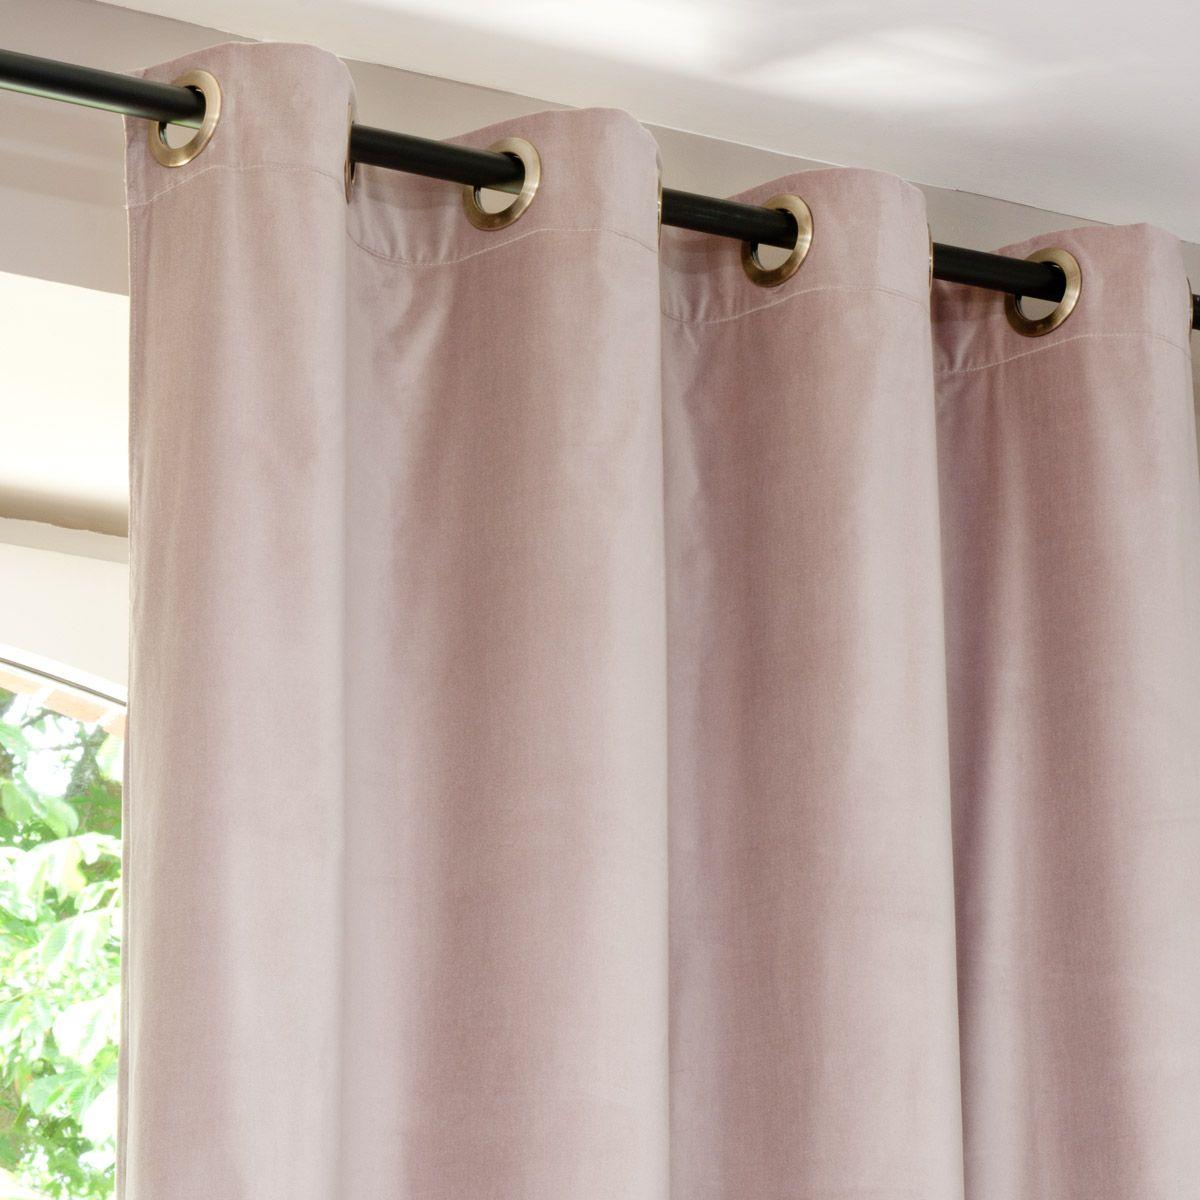 samt vorhang altrosa 140 x 300 cm maisons du monde textiles pinterest altrosa vorh nge. Black Bedroom Furniture Sets. Home Design Ideas